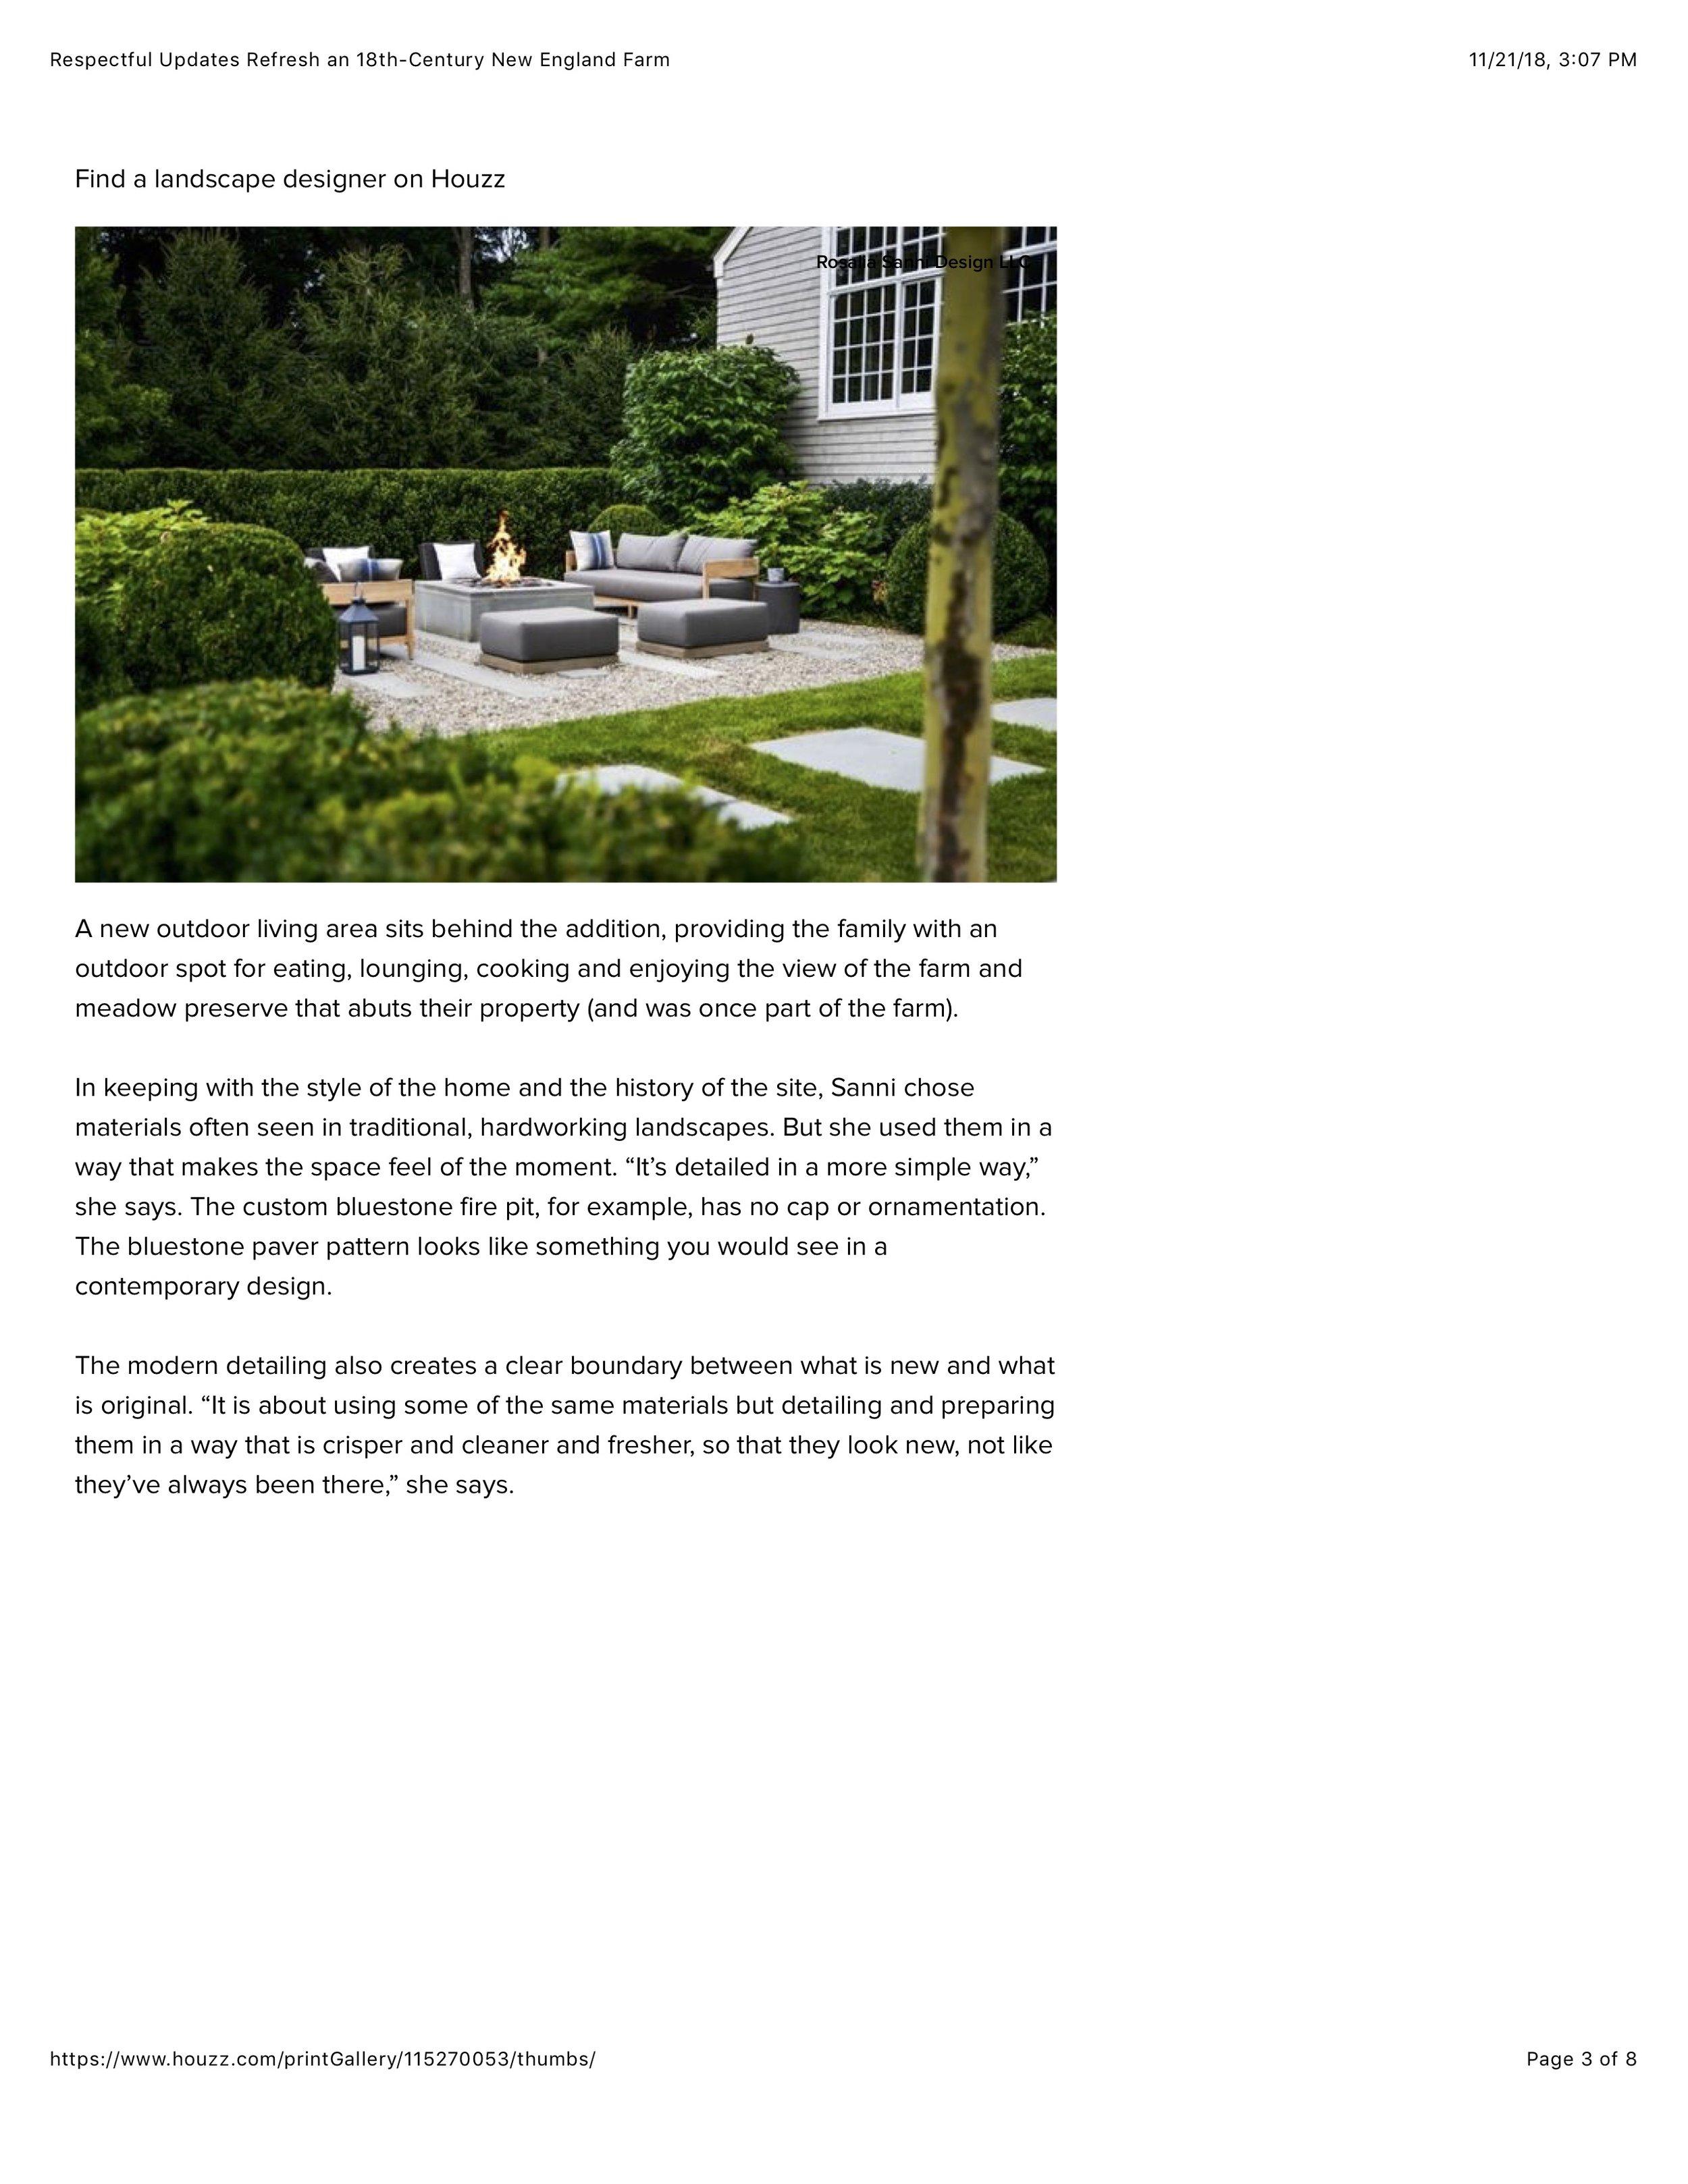 Respectful Updates Refresh an 18th-Century New England Farm 3.jpg